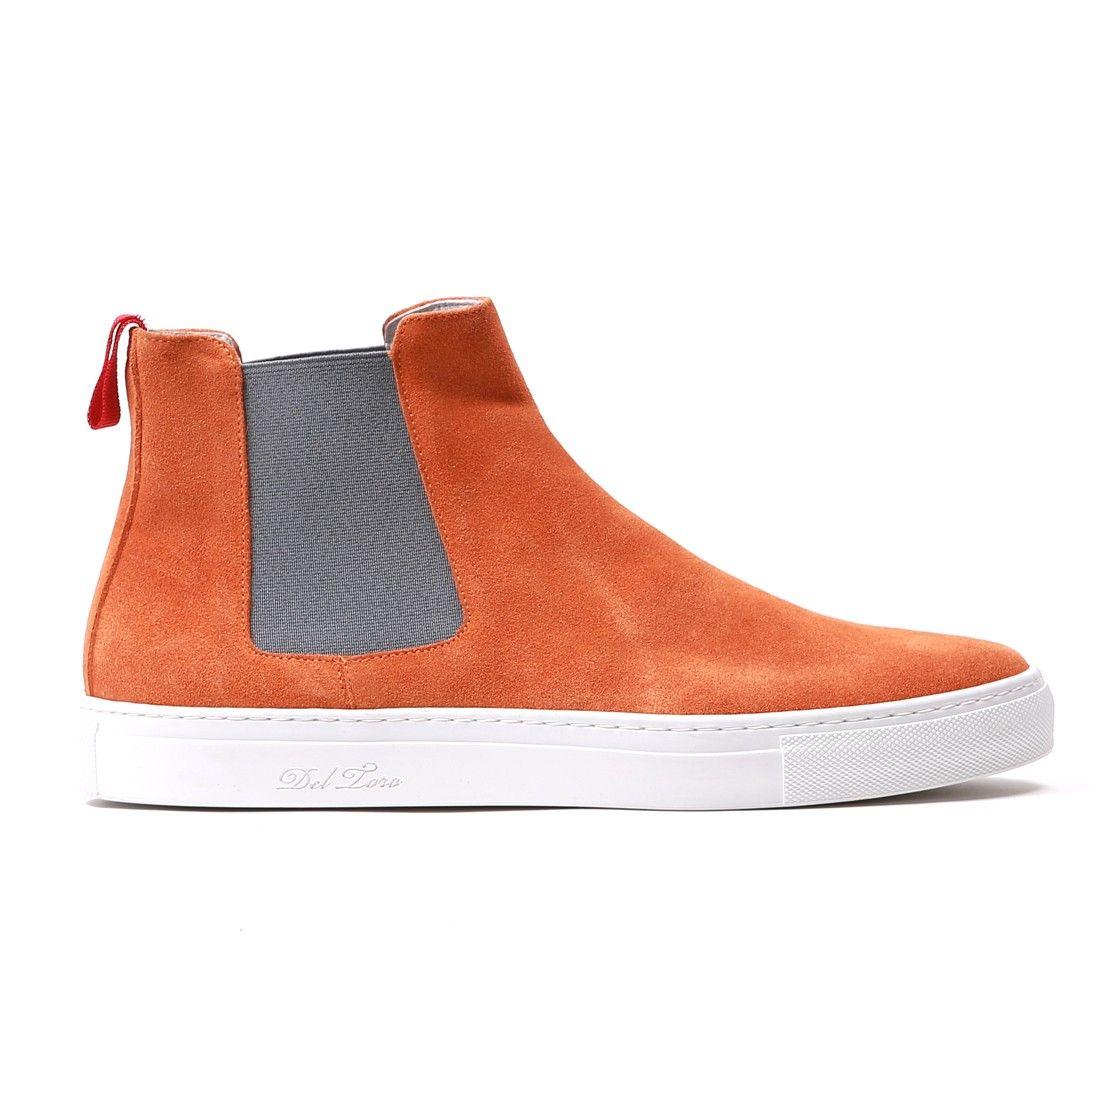 DEL TORO. Suede Chelsea BootsSneakerOrangeMenSlippersSneakersPlimsoll ...